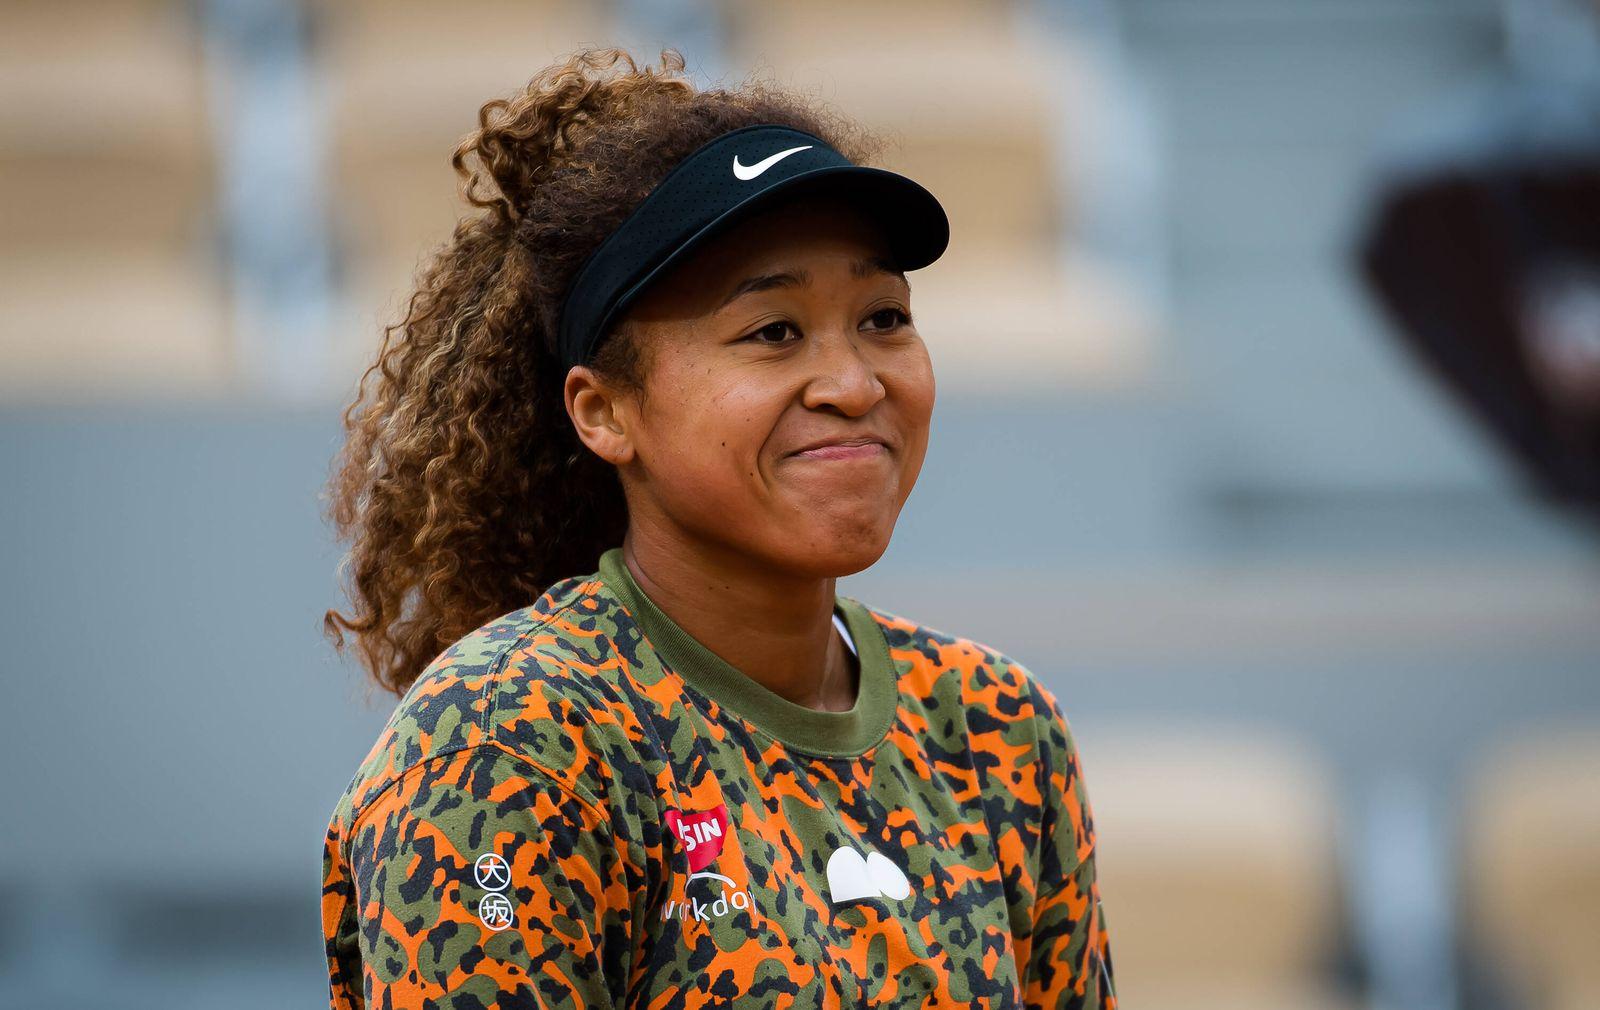 May 26, 2021: Naomi Osaka of Japan during practice ahead of the 2021 Roland Garros Grand Slam Tournament - ZUMAa181 2021